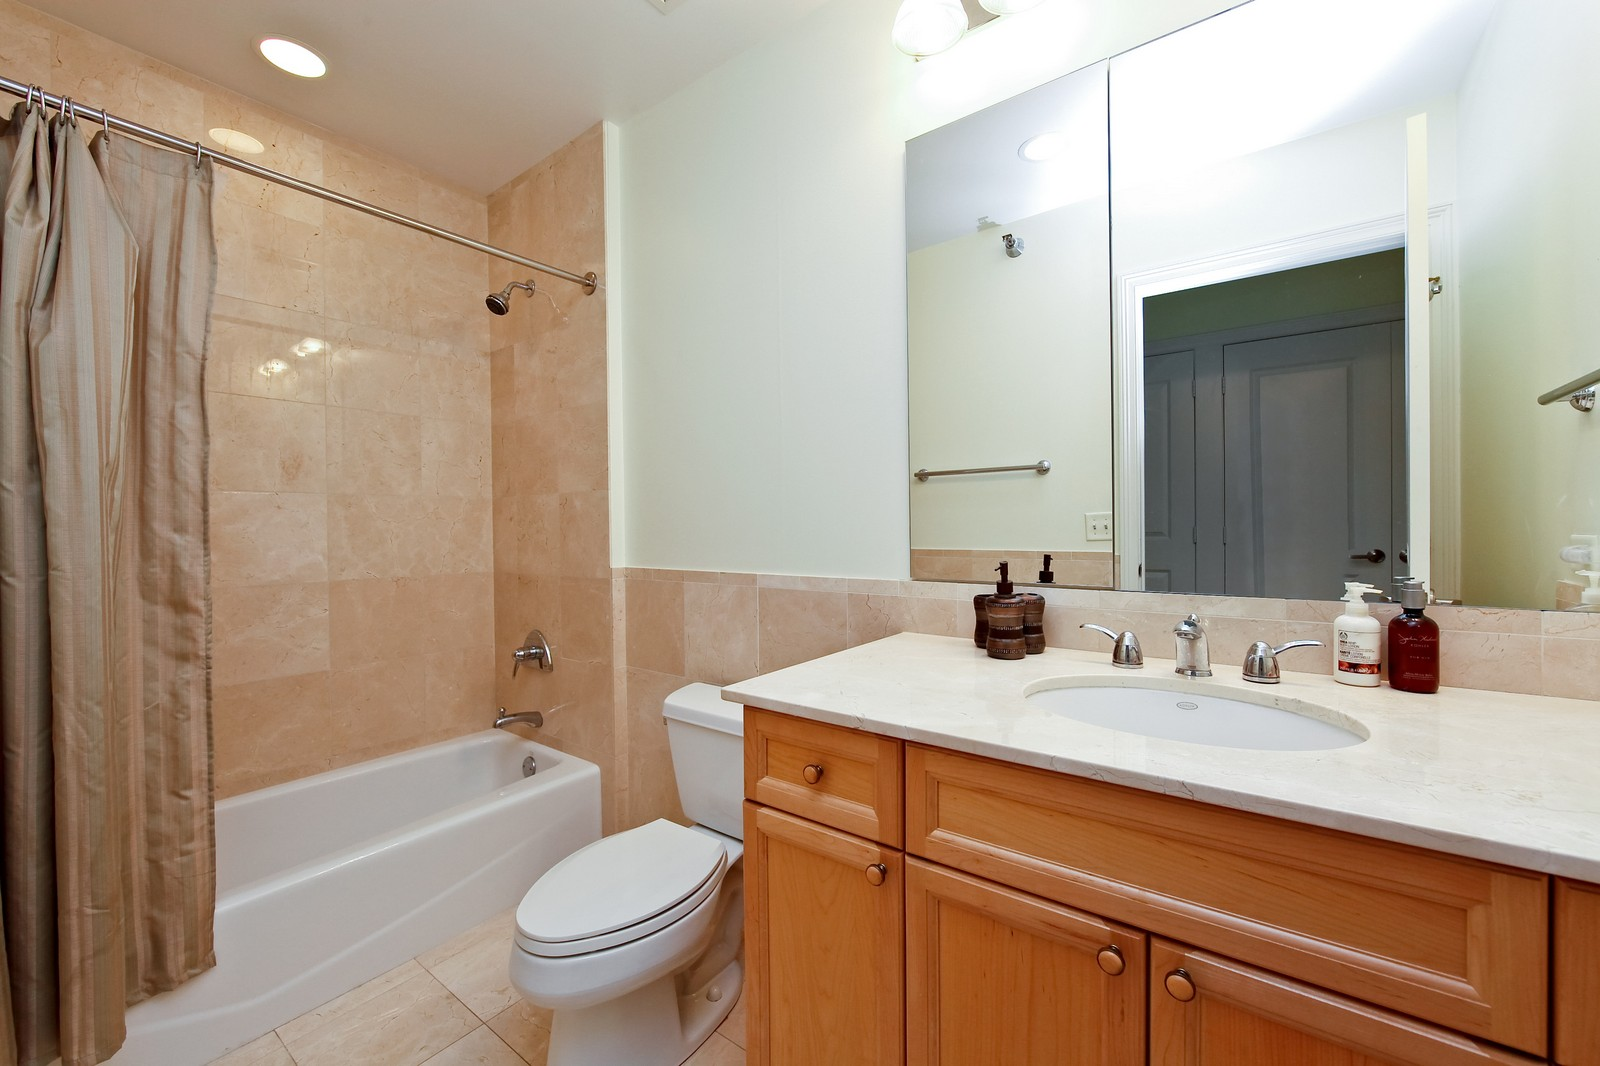 Real Estate Photography - 55 E Erie, 2005, Chicago, IL, 60611 - Bathroom